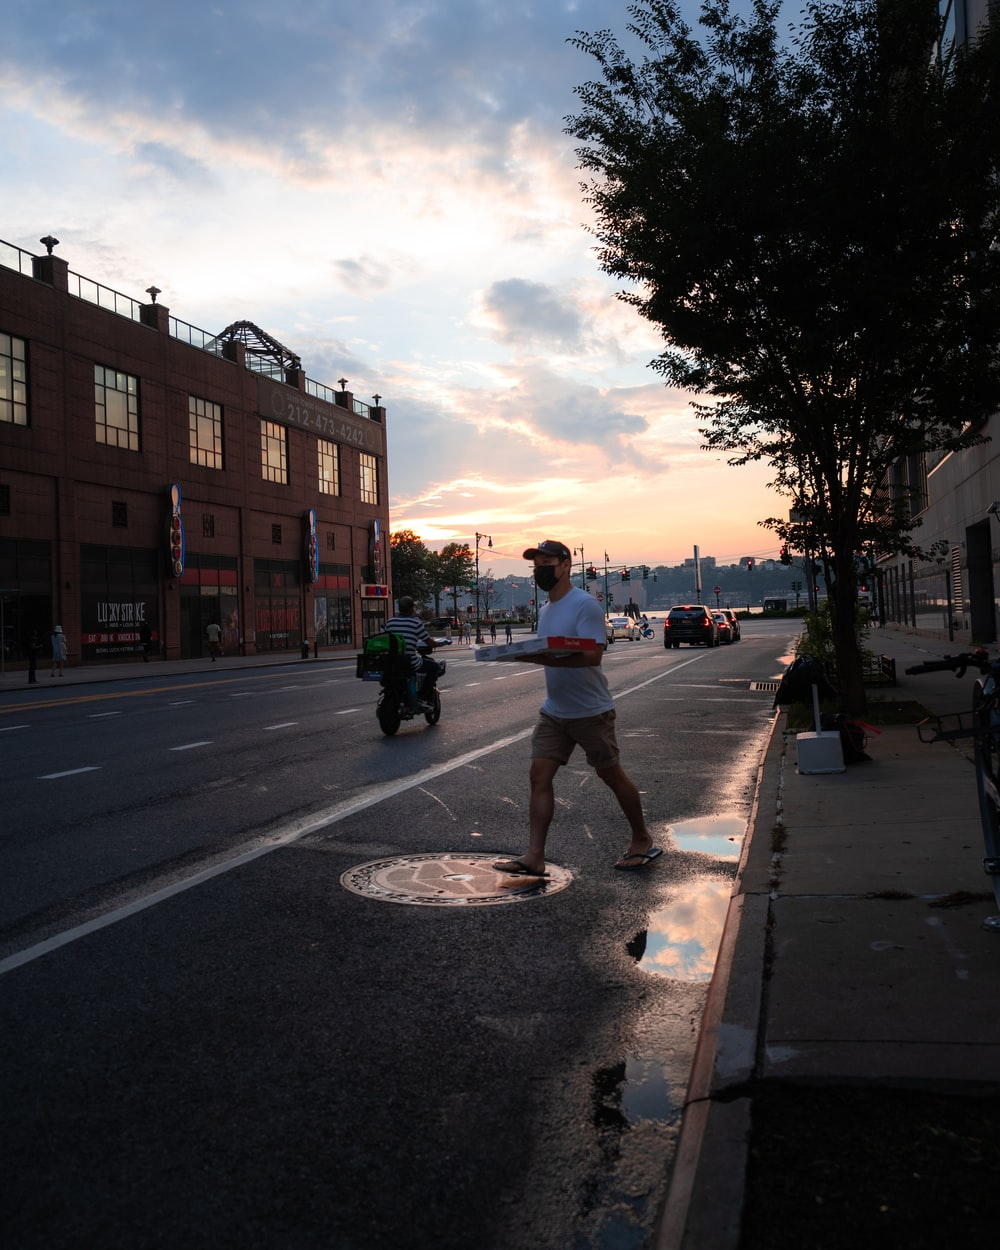 man in white t-shirt and blue denim jeans walking on sidewalk during daytime